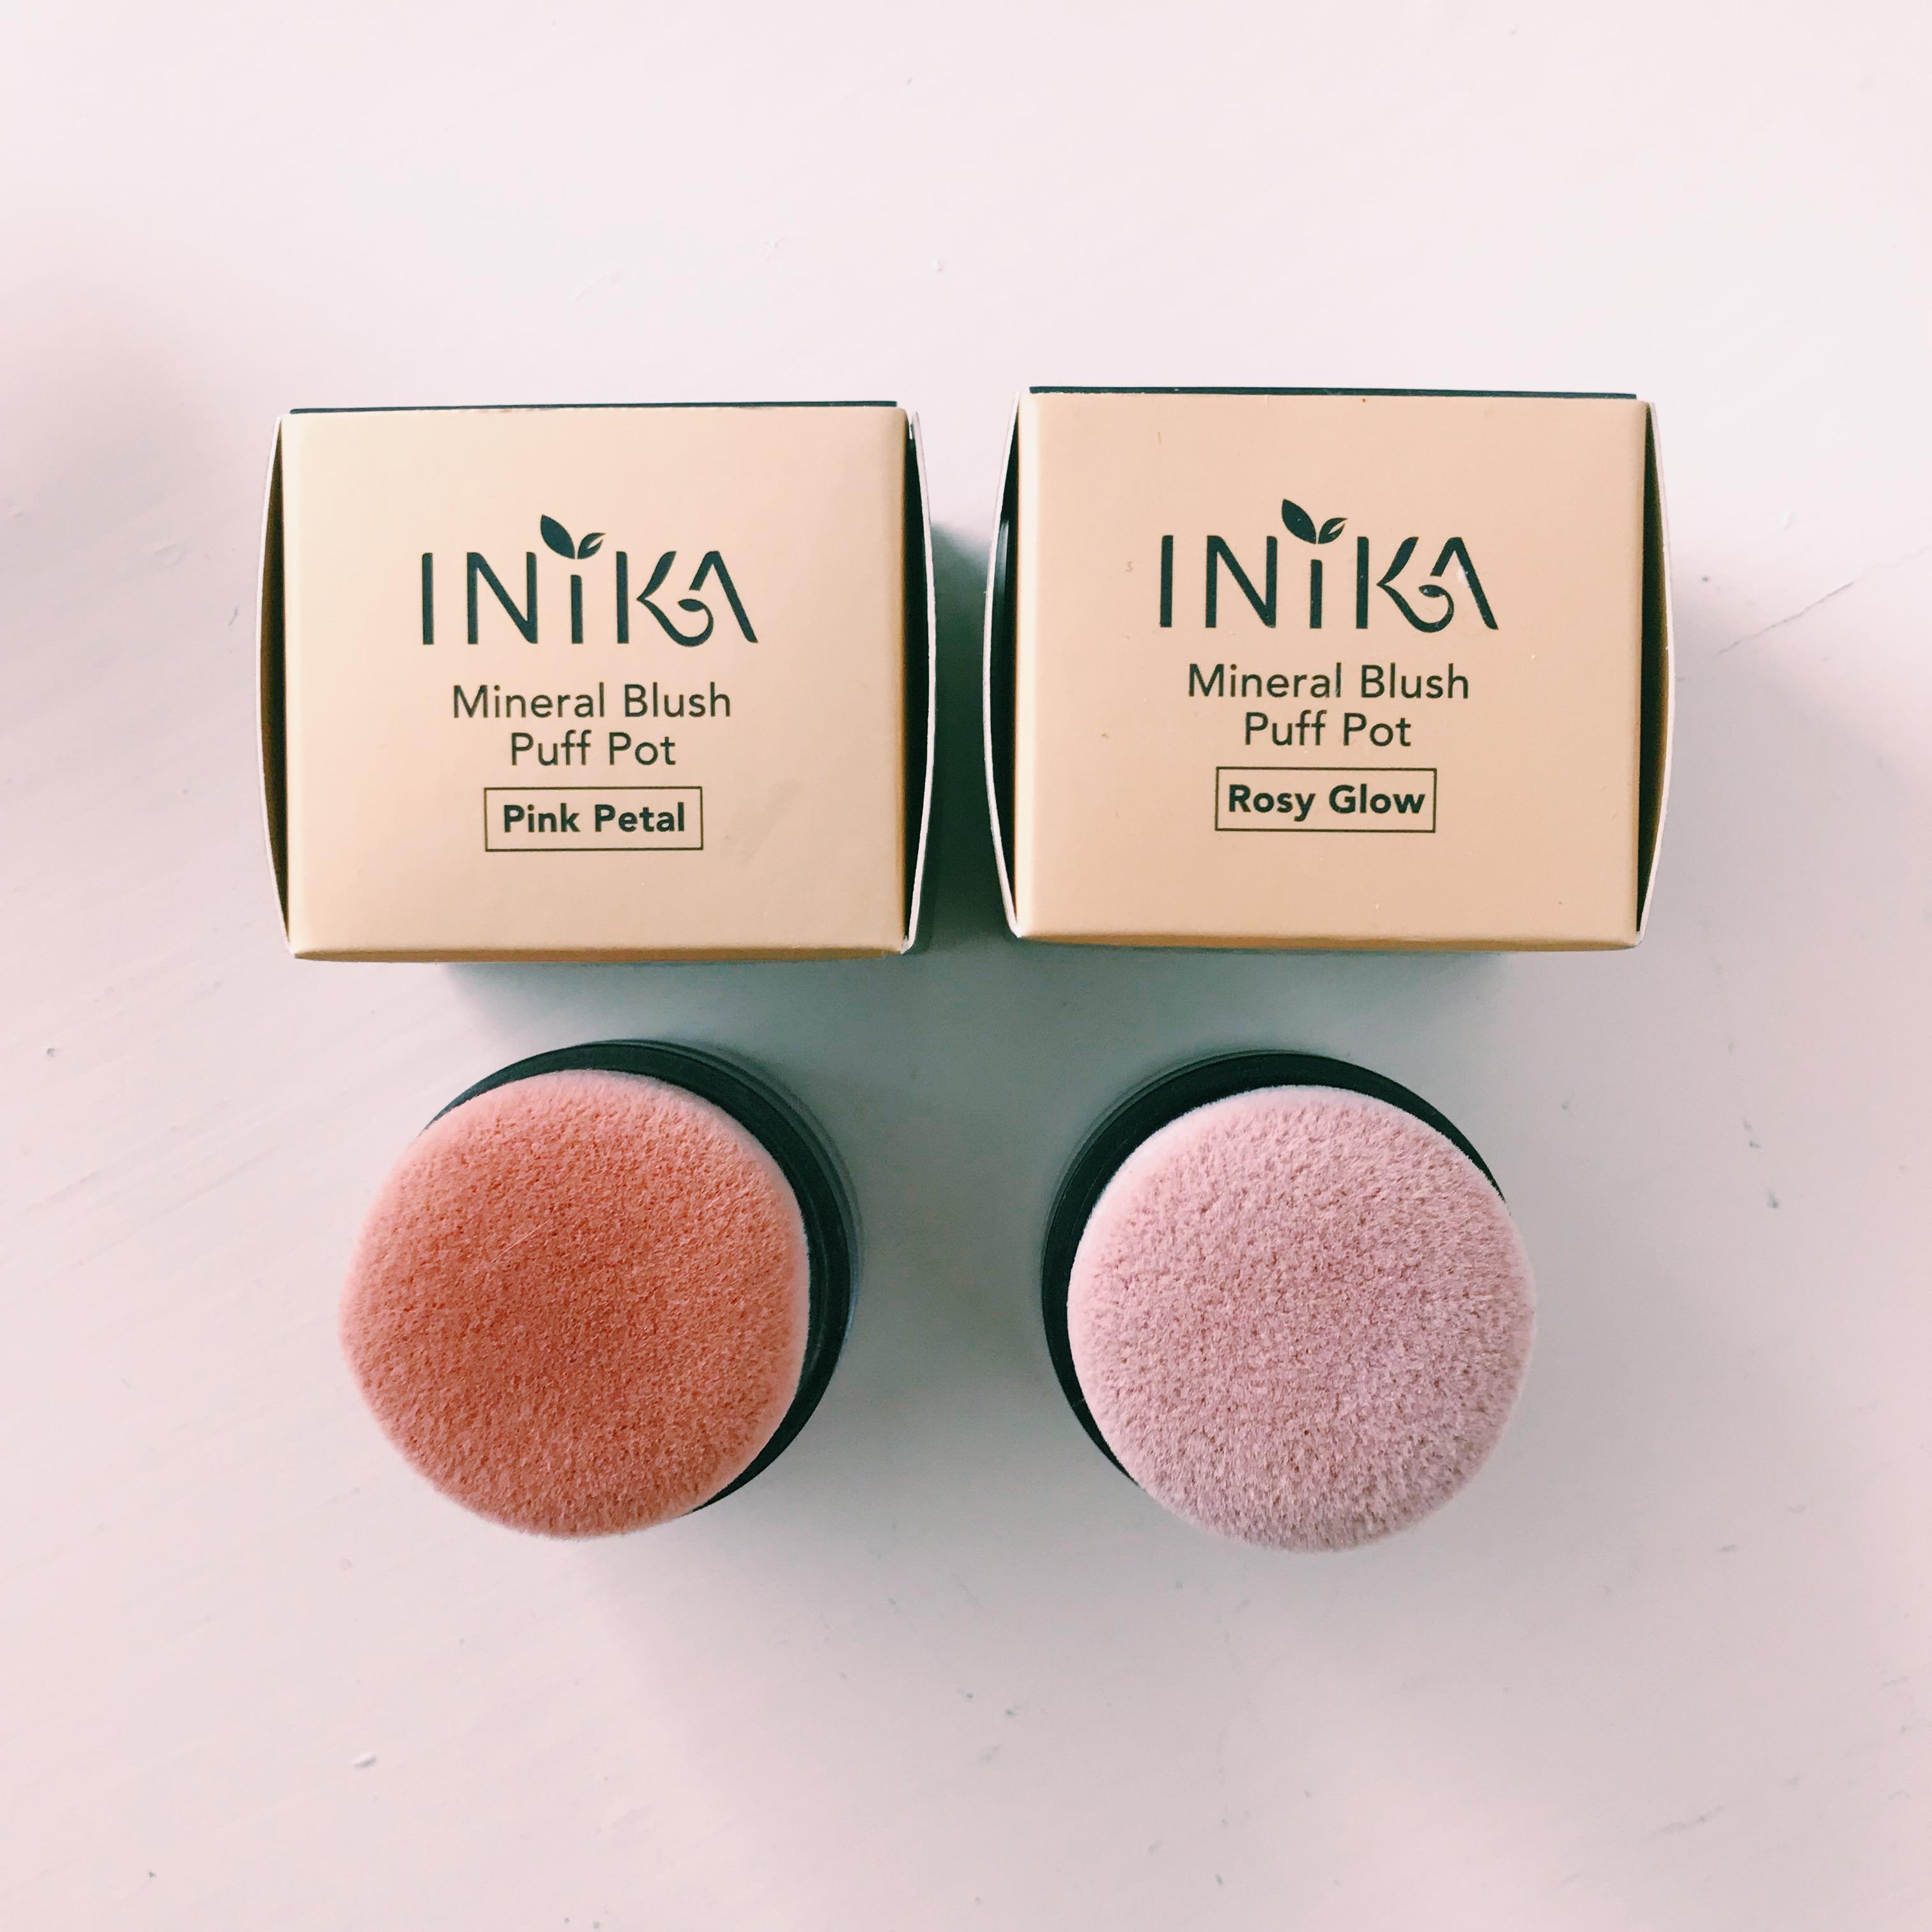 Mineral Blush Puff Pot - rouge - INIKA Organic